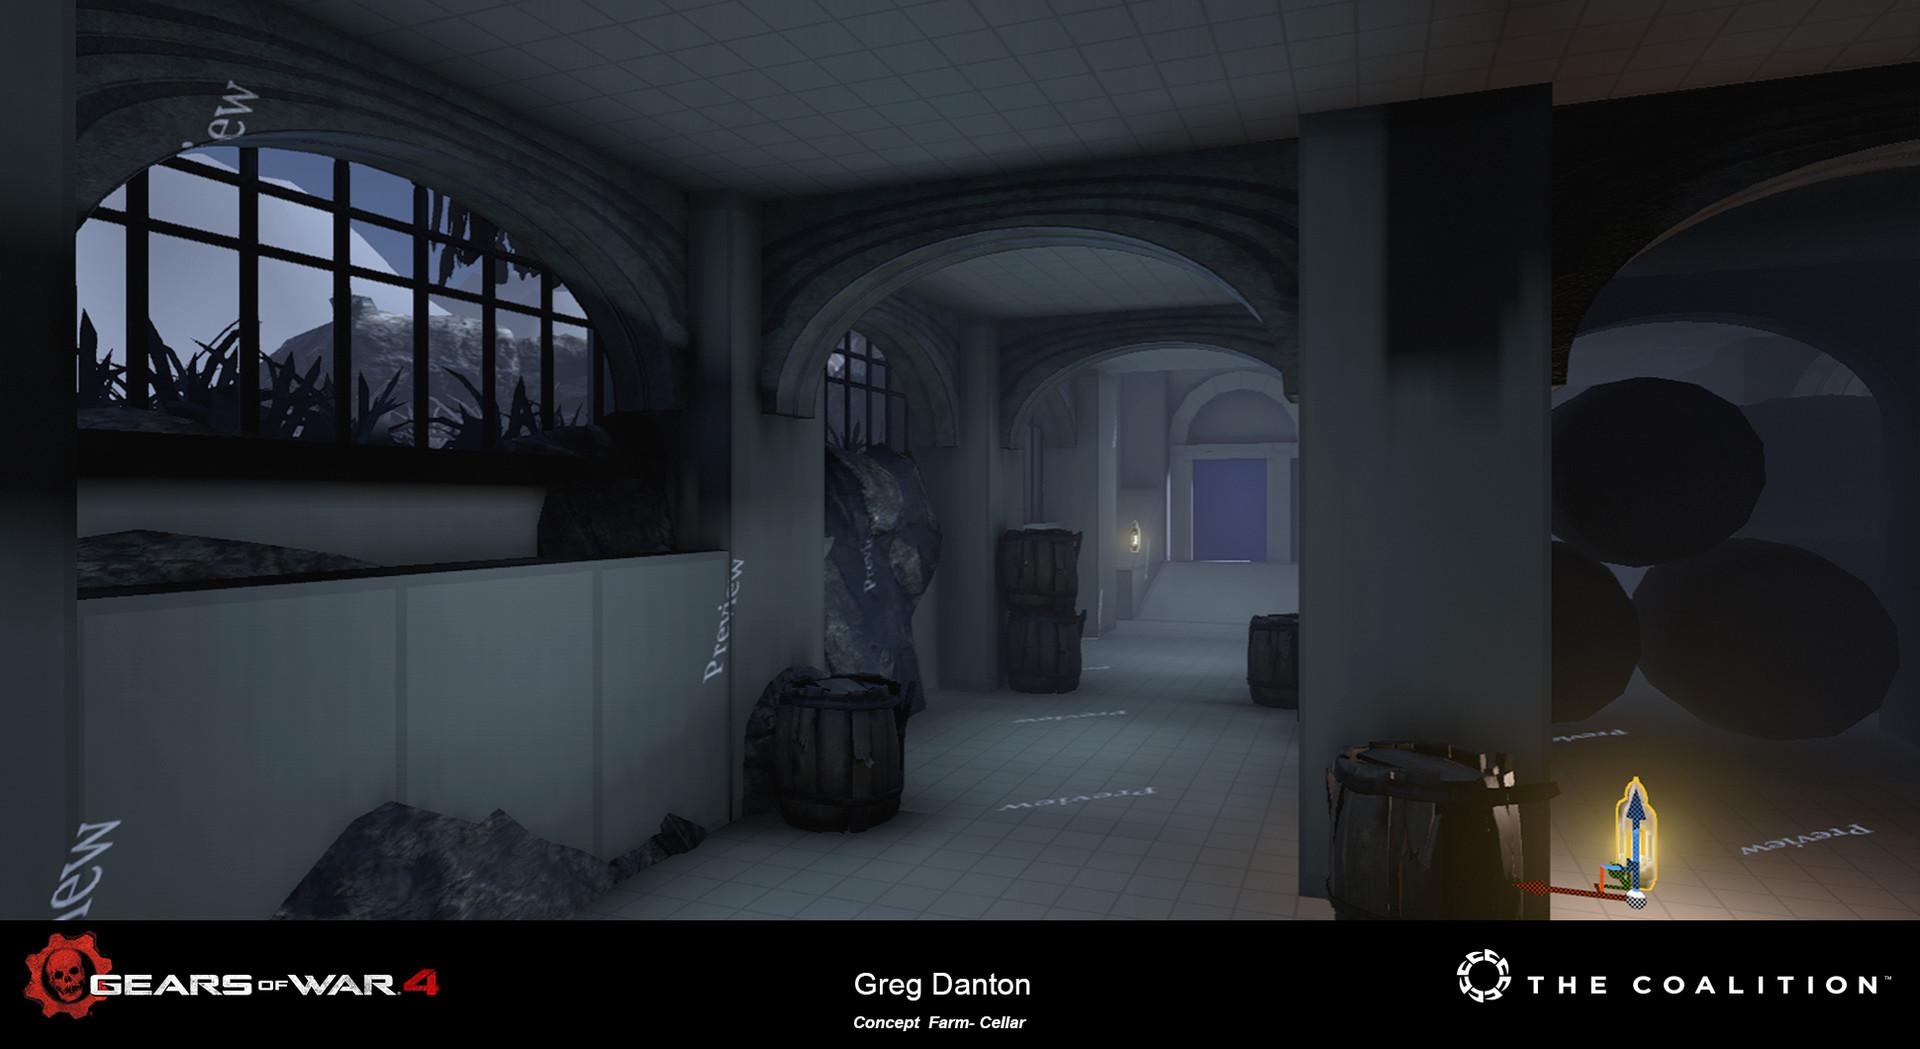 Greg danton art 27b